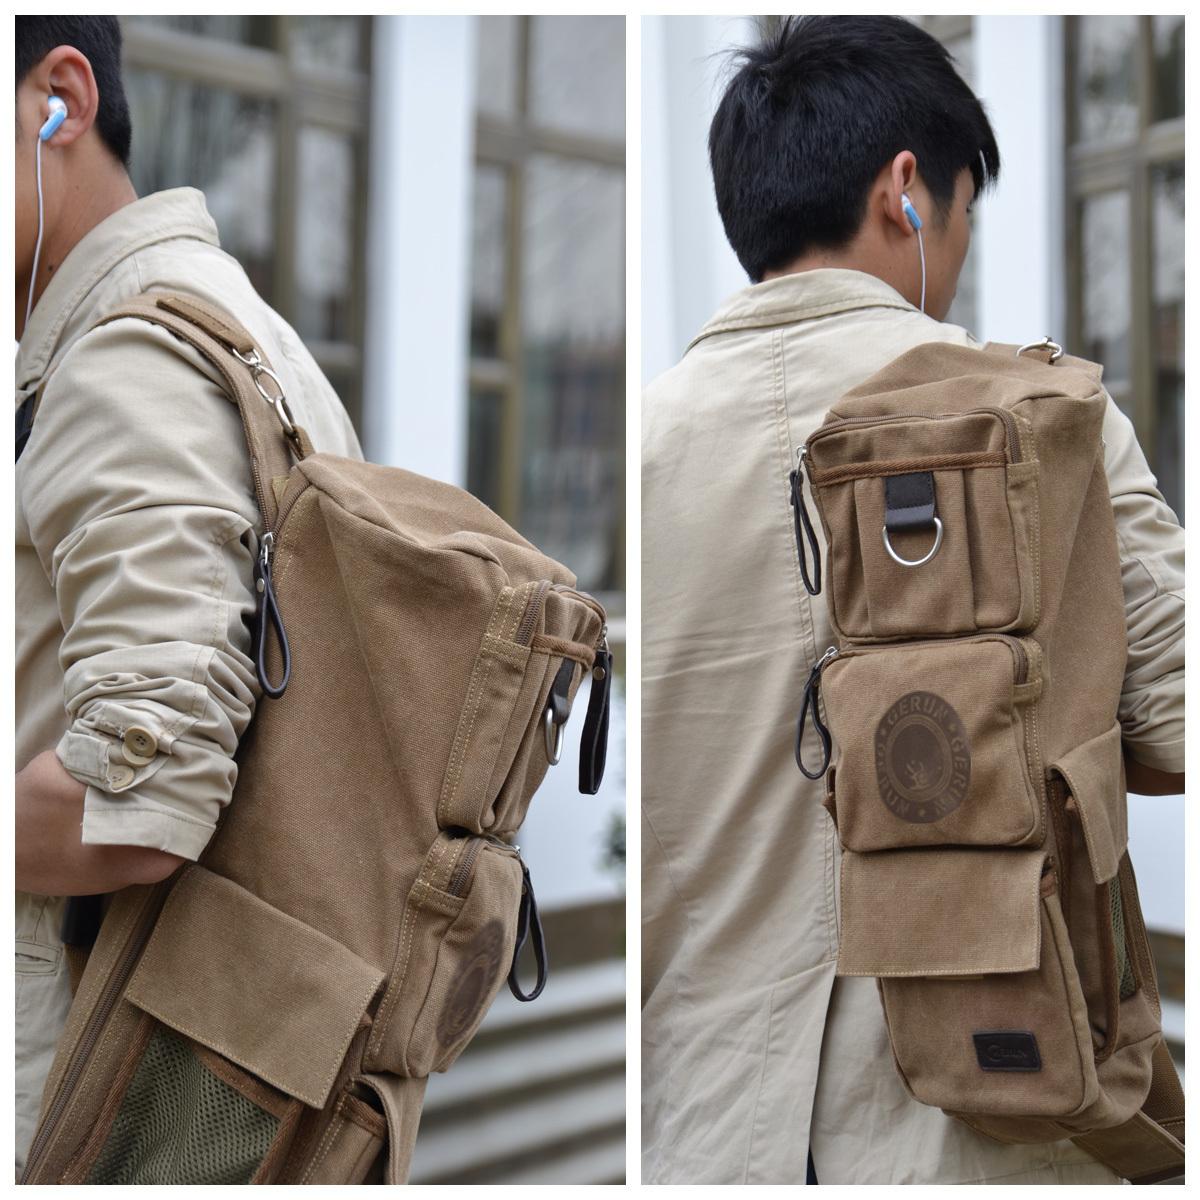 Дорожная сумка Gerun 6002 Gerun / Song Rui